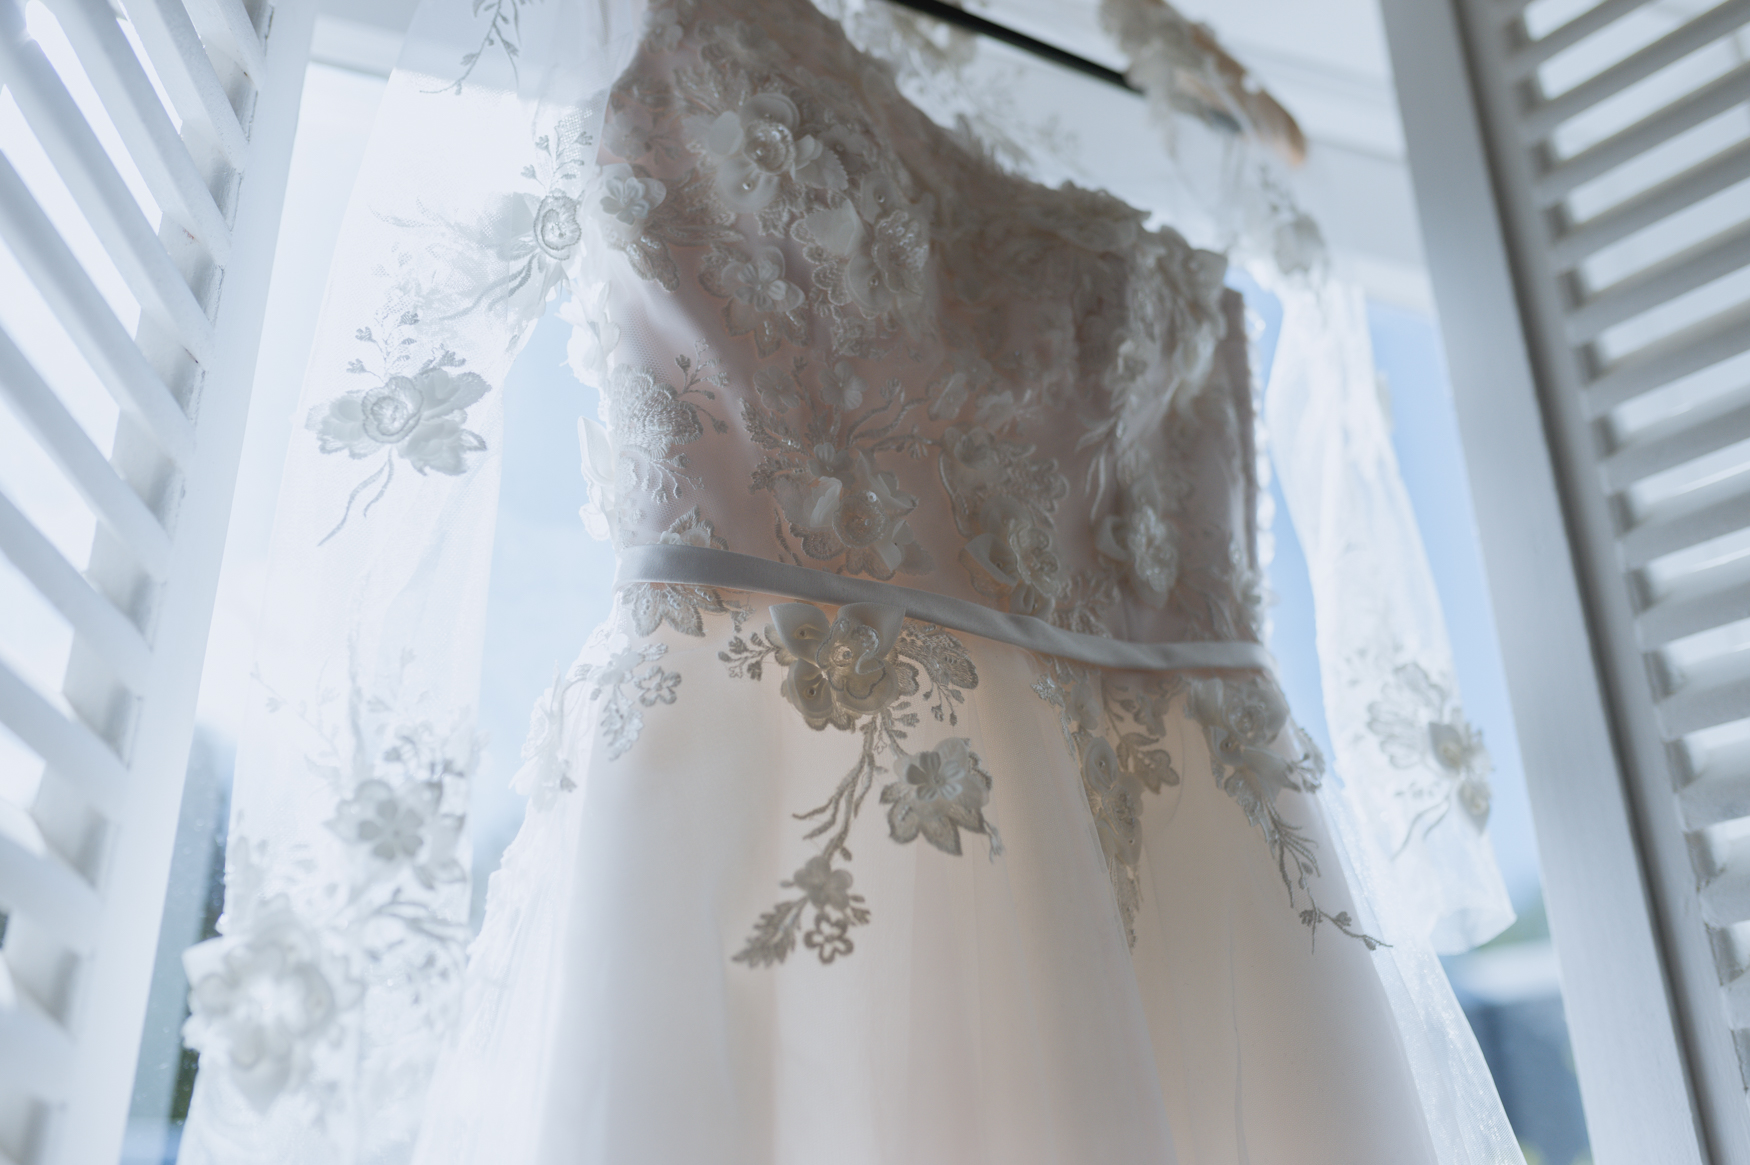 Leon_&_Martine's_Wedding_Photographs_17th_April_2019_@johnhenryweddingphoto_Low_Resolution_Web-064.JPG